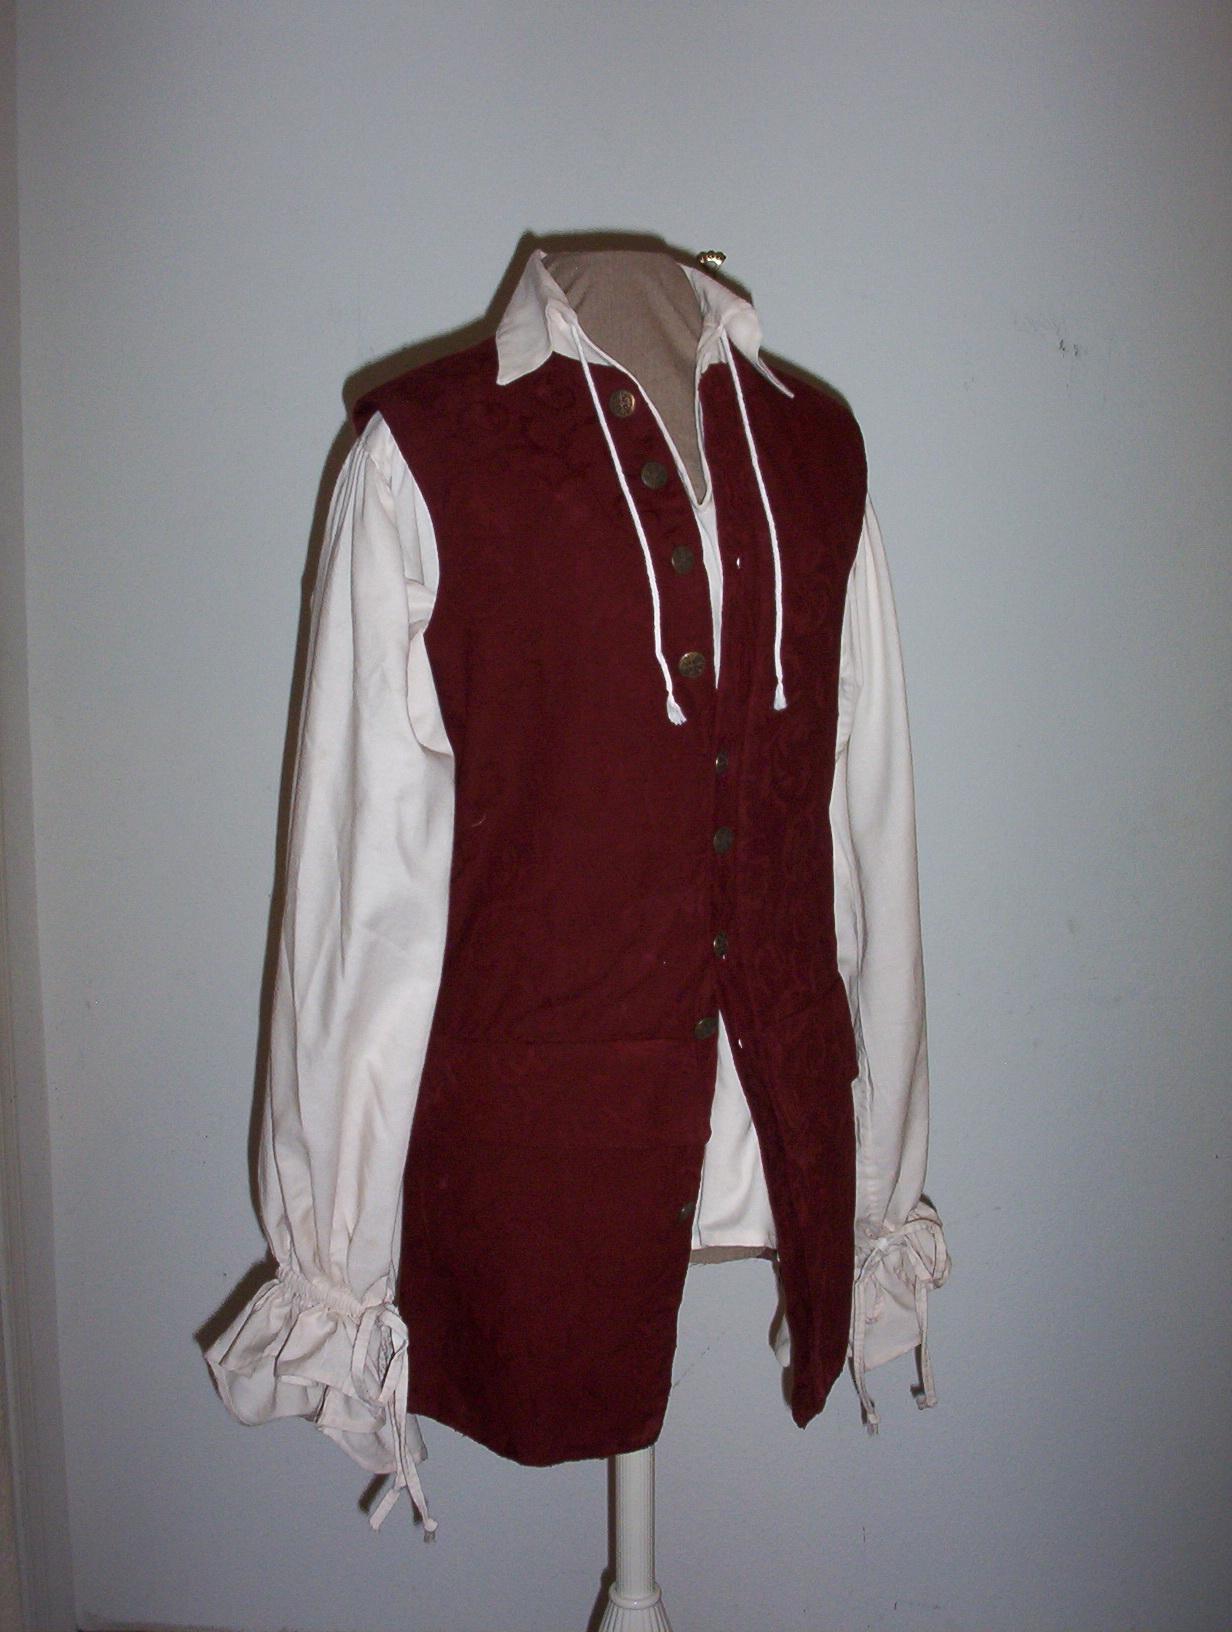 Pirate costume2 3009 (10).jpg